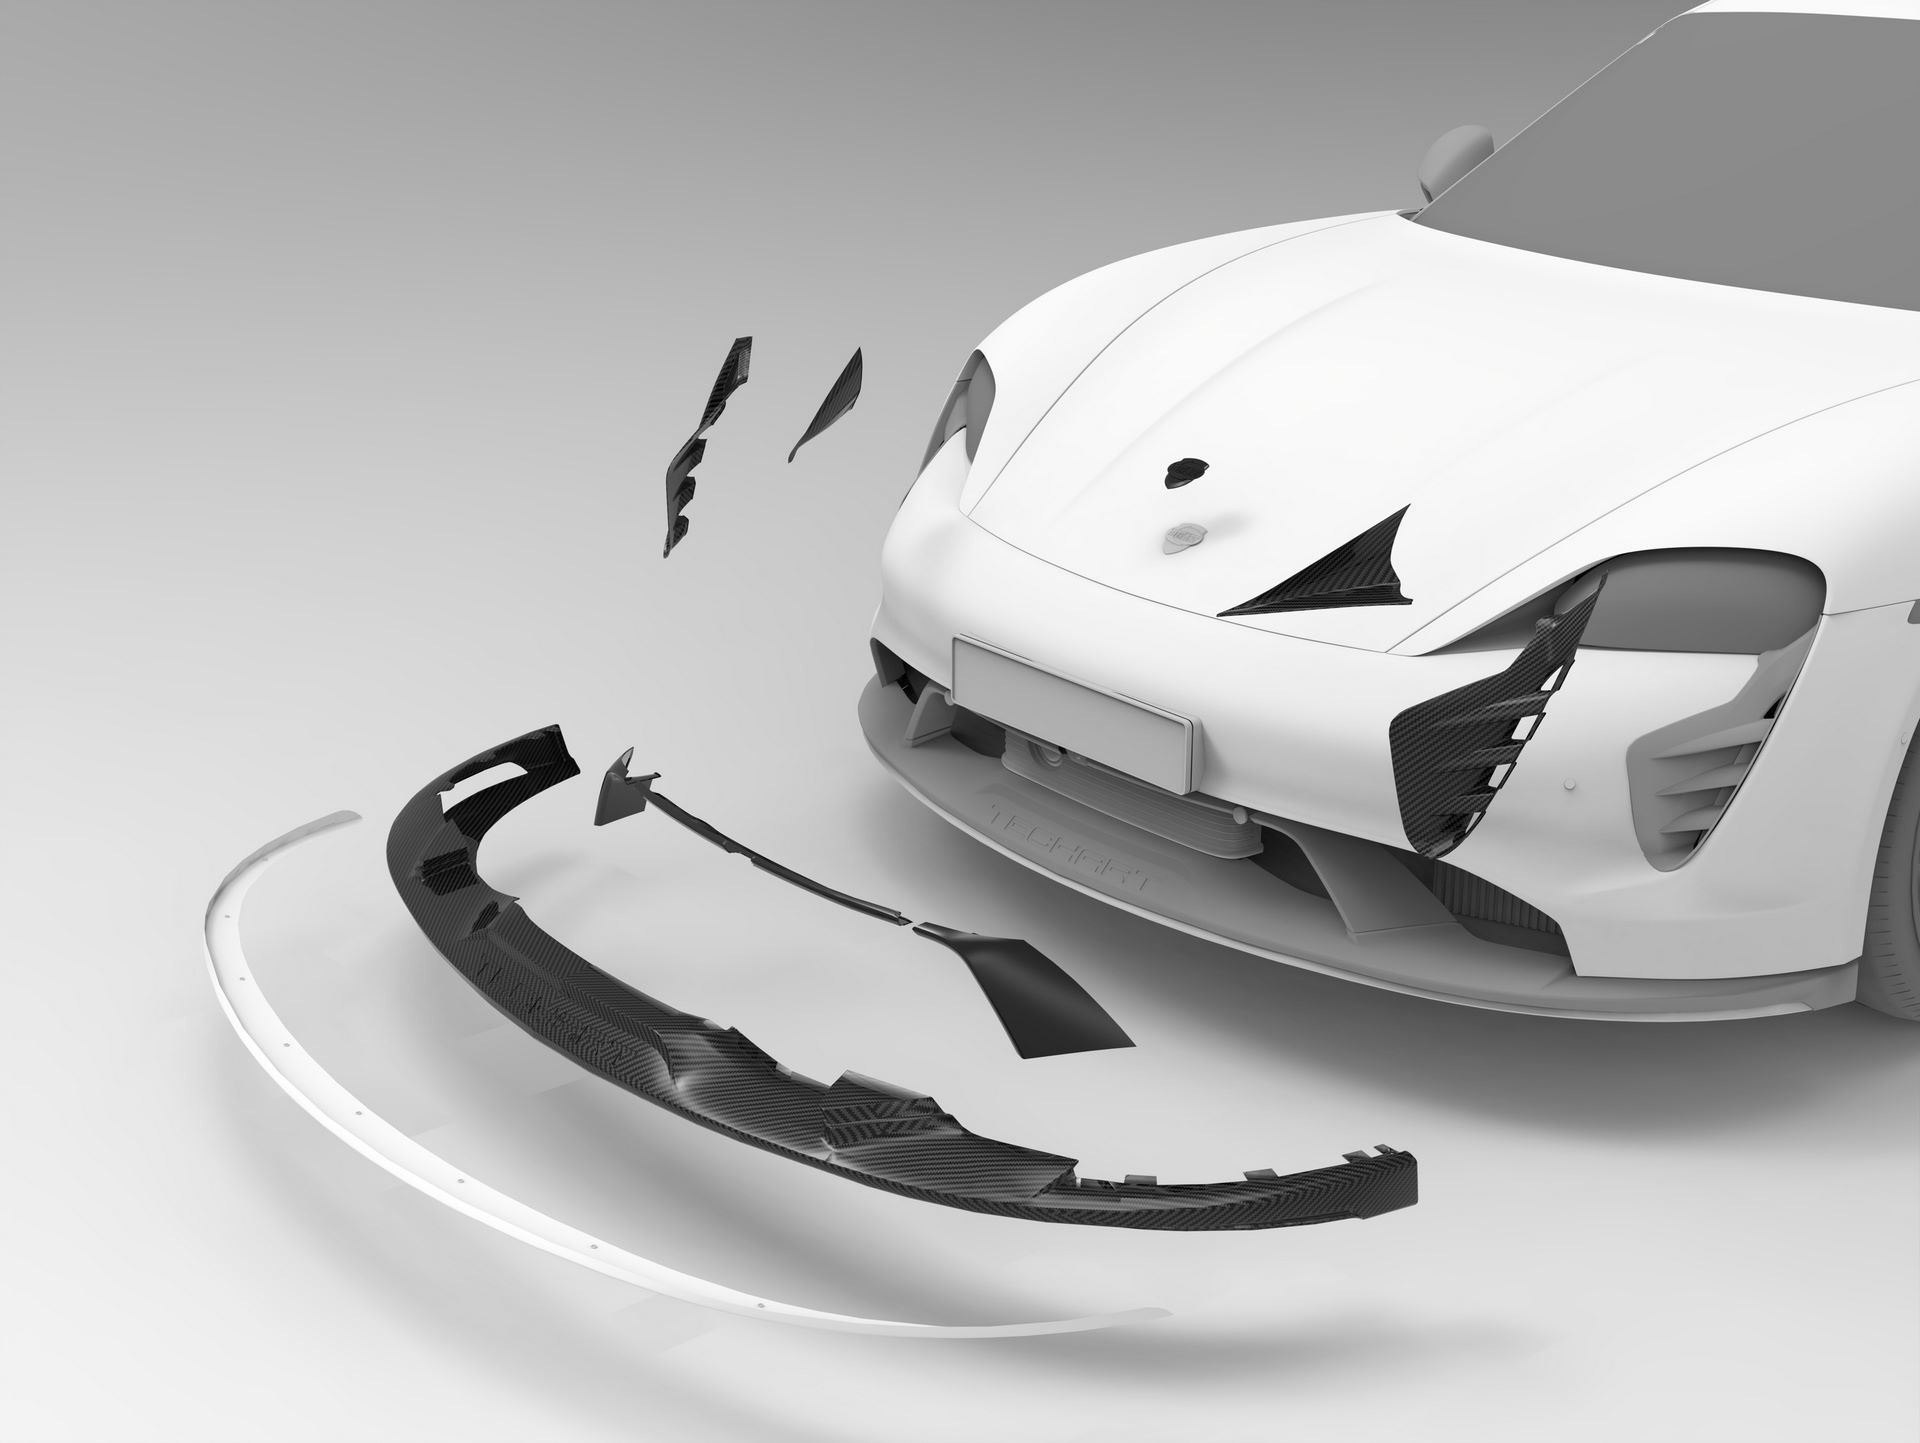 Porsche-Taycan-bodykit-by-TechArt-27